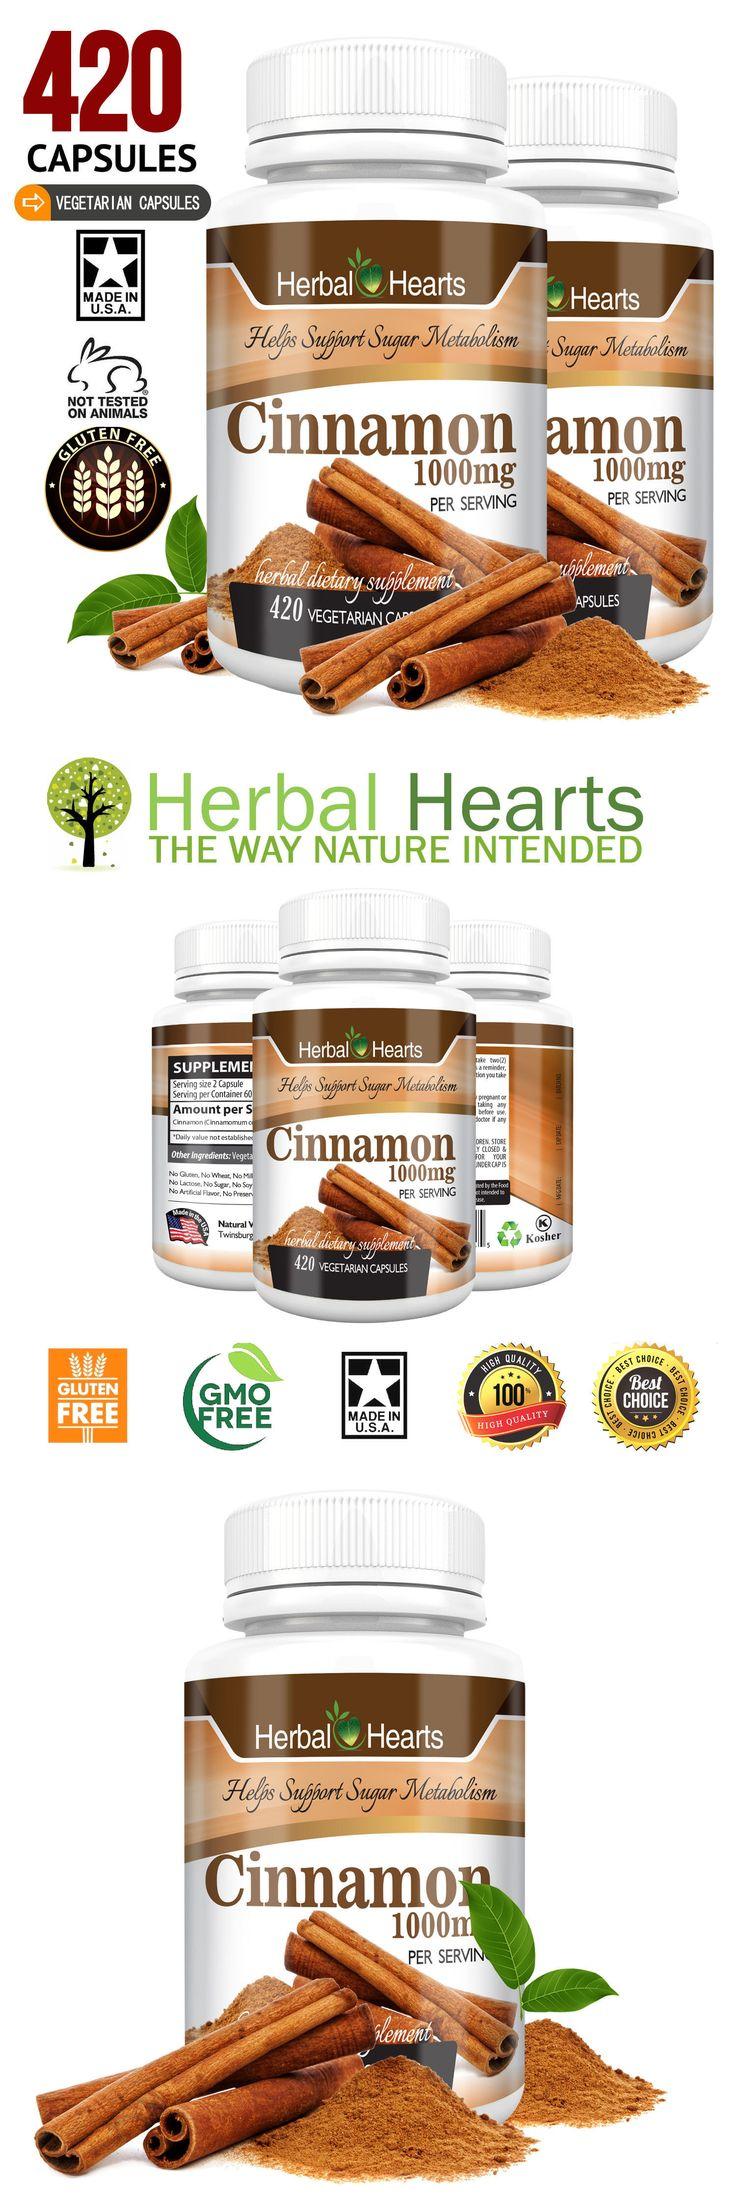 Herbs and Botanicals: Cinnamon Ceylon 1000Mg 420 Vegetarian Capsules -100% Organic! - Herbal Hearts BUY IT NOW ONLY: $37.99